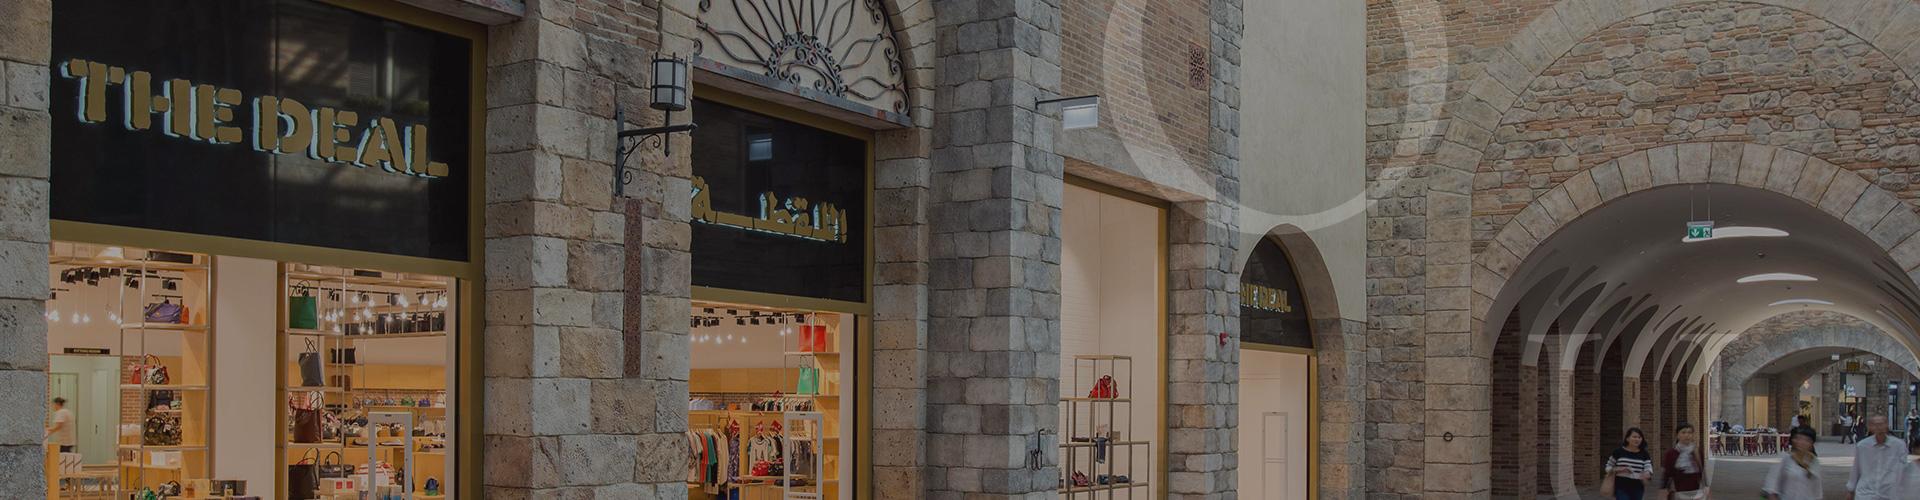 For DubaiUae Designer Clothing Deal The LessOutlet Village A4j35RL